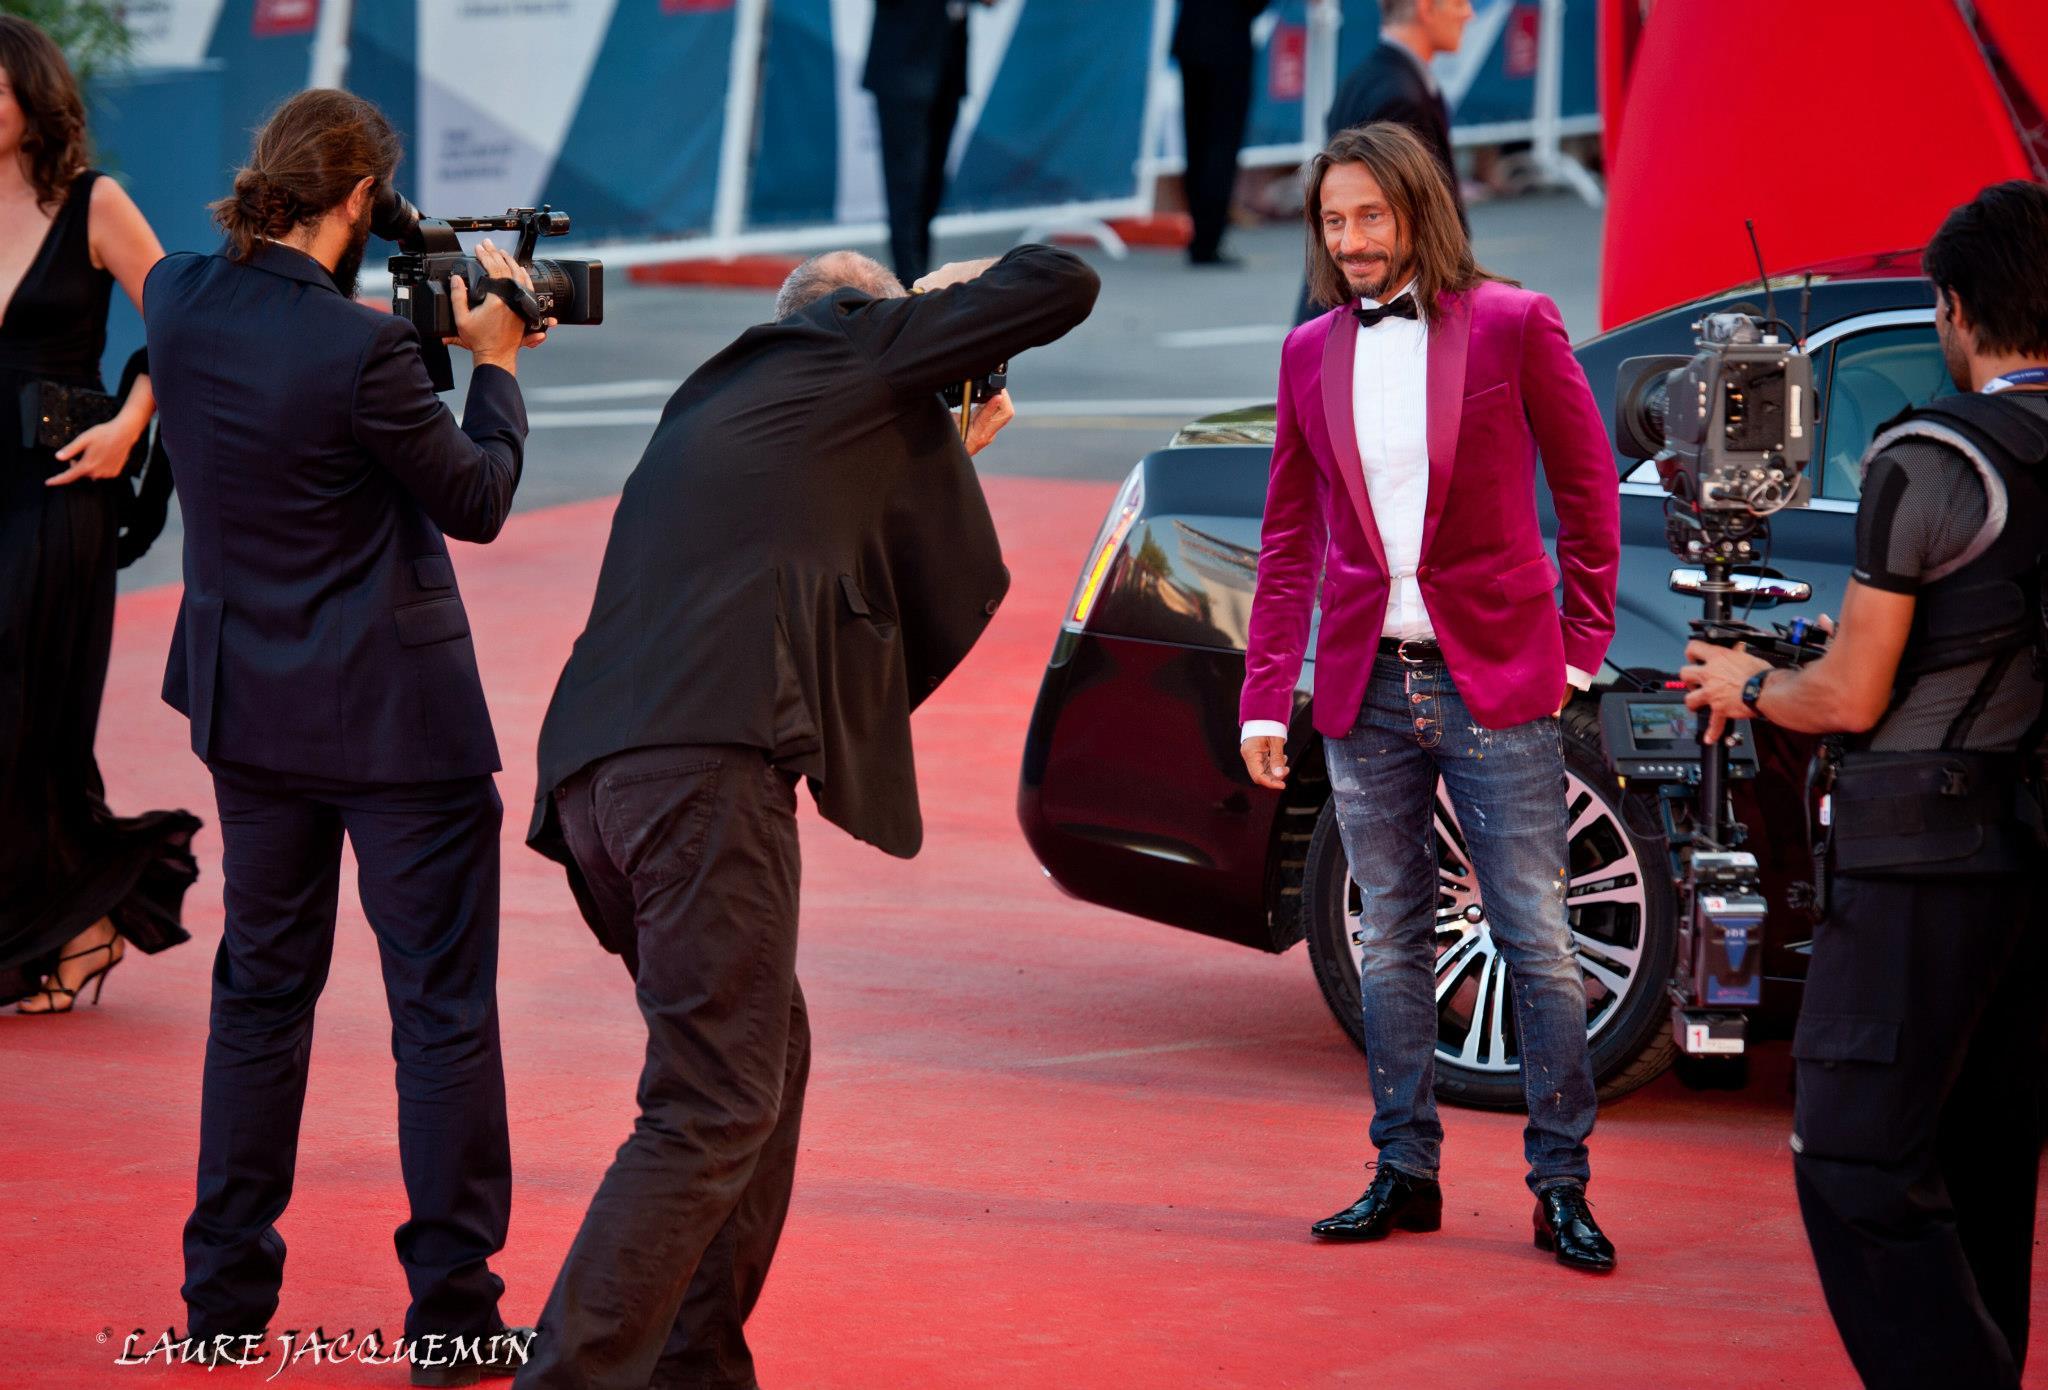 mostra+del+cinema+laure+jacquemin+venise+photographe+(105).jpg